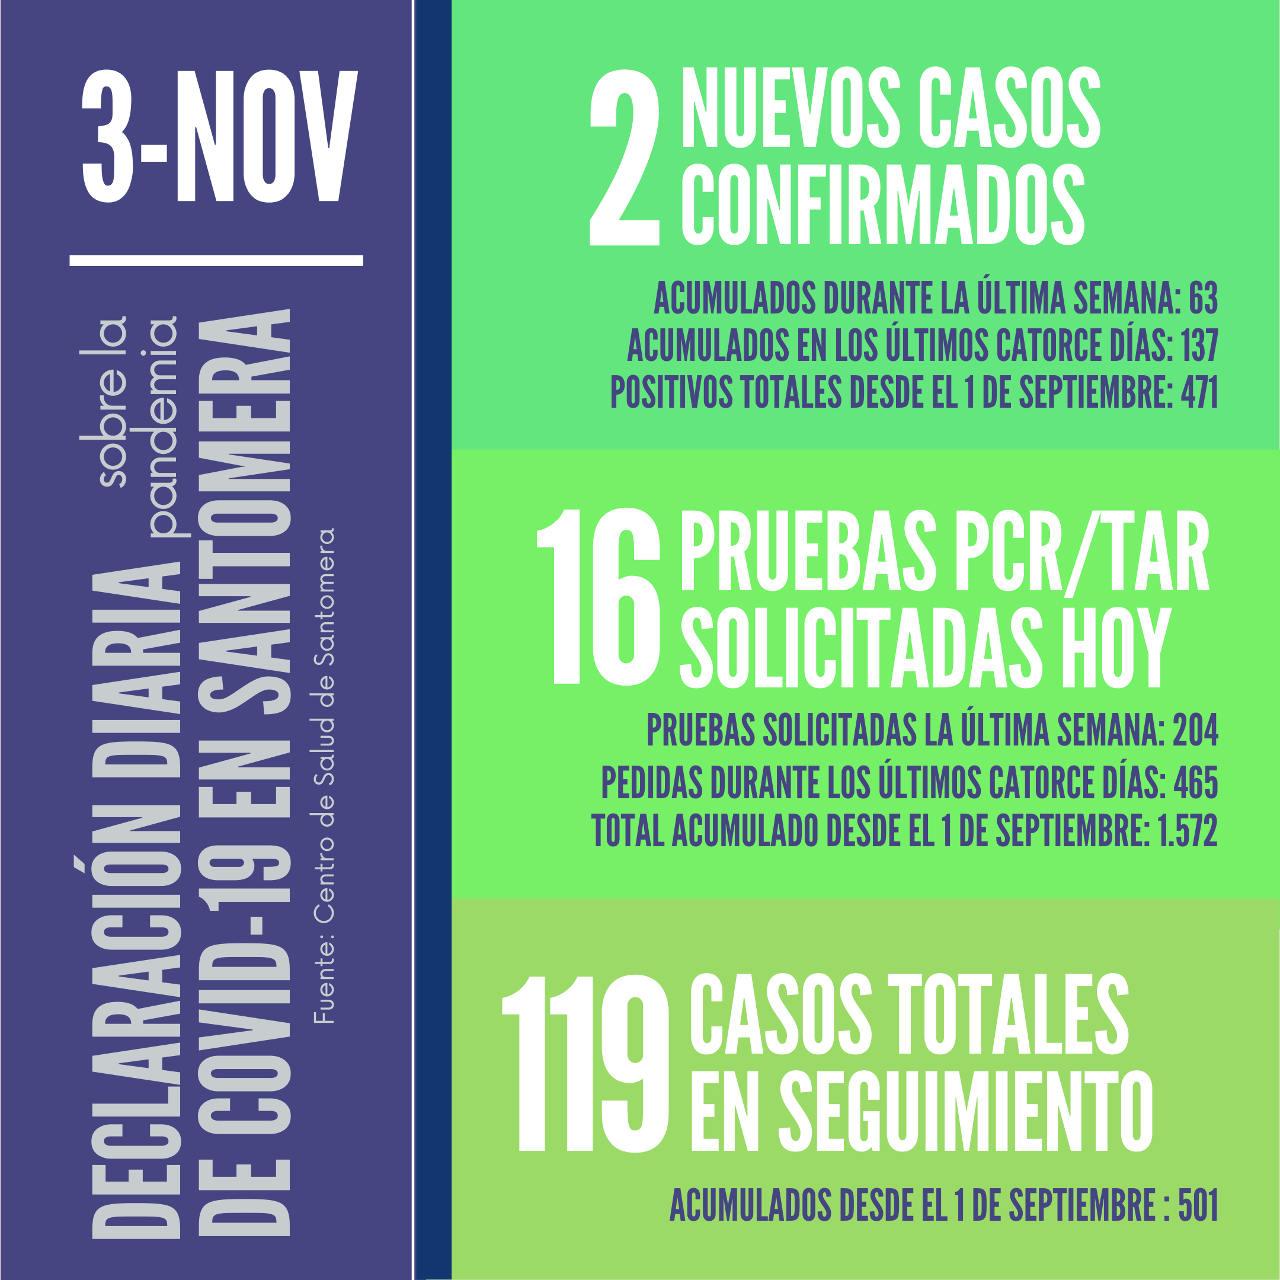 20201103_Datos COVID-19 Santomera